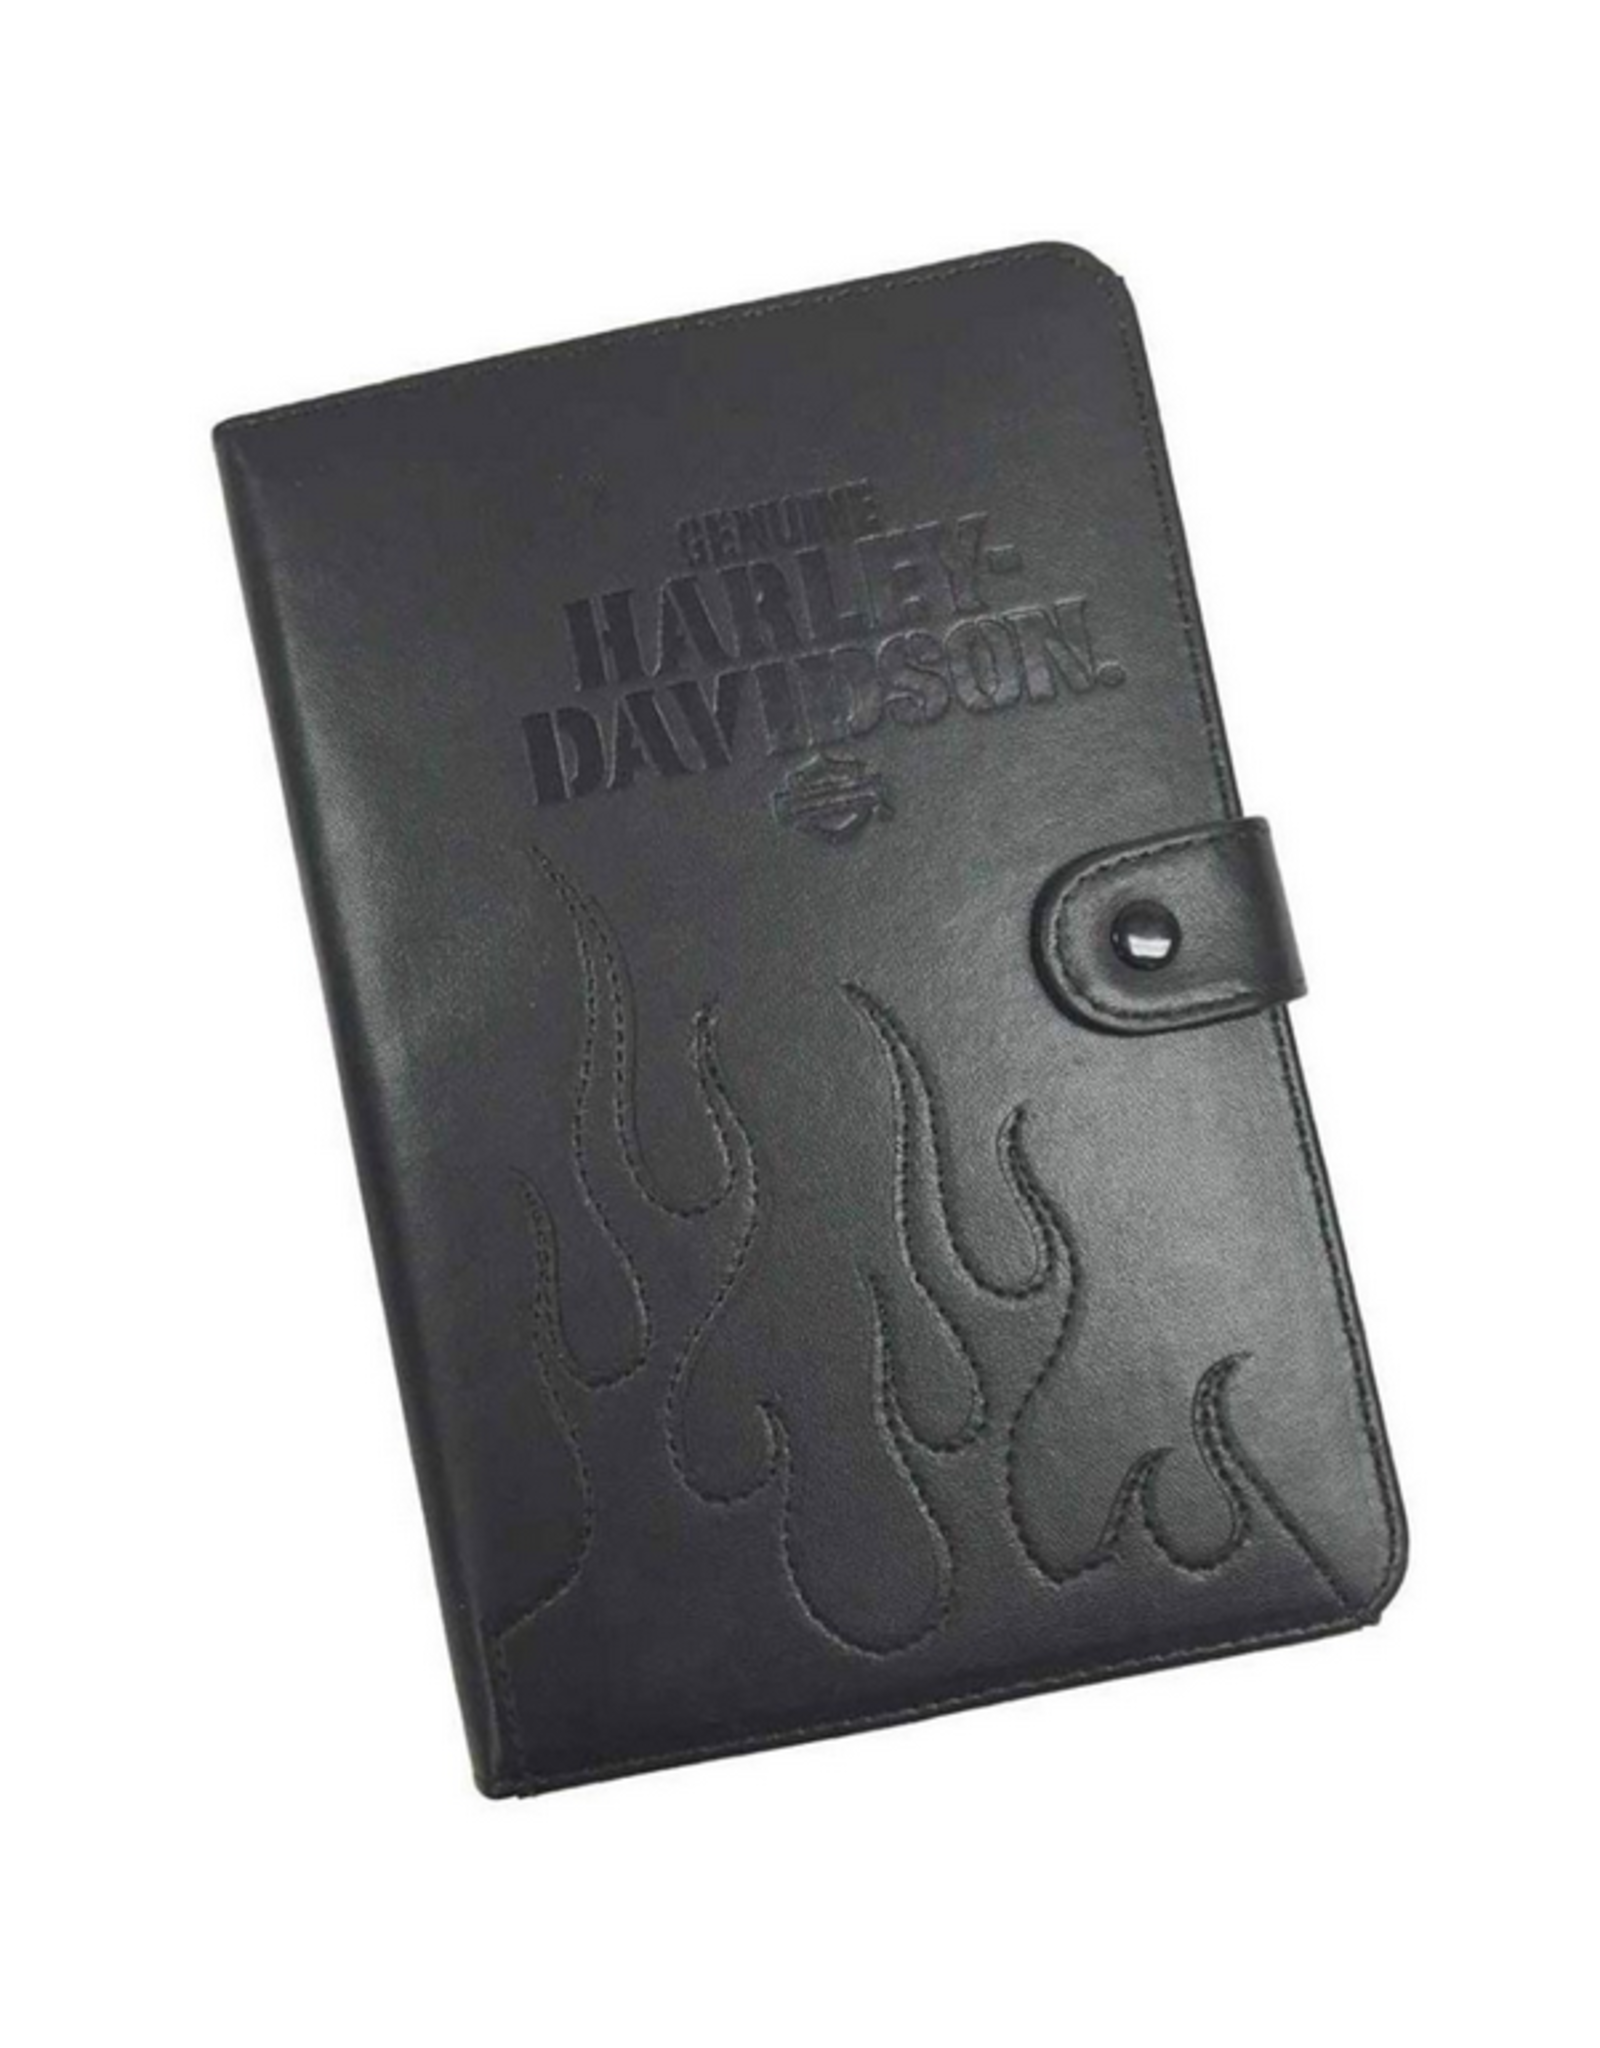 Harley Davidson Harley Davidson Universal 7-9 in Tablet Folio Black Leather SKU:50259